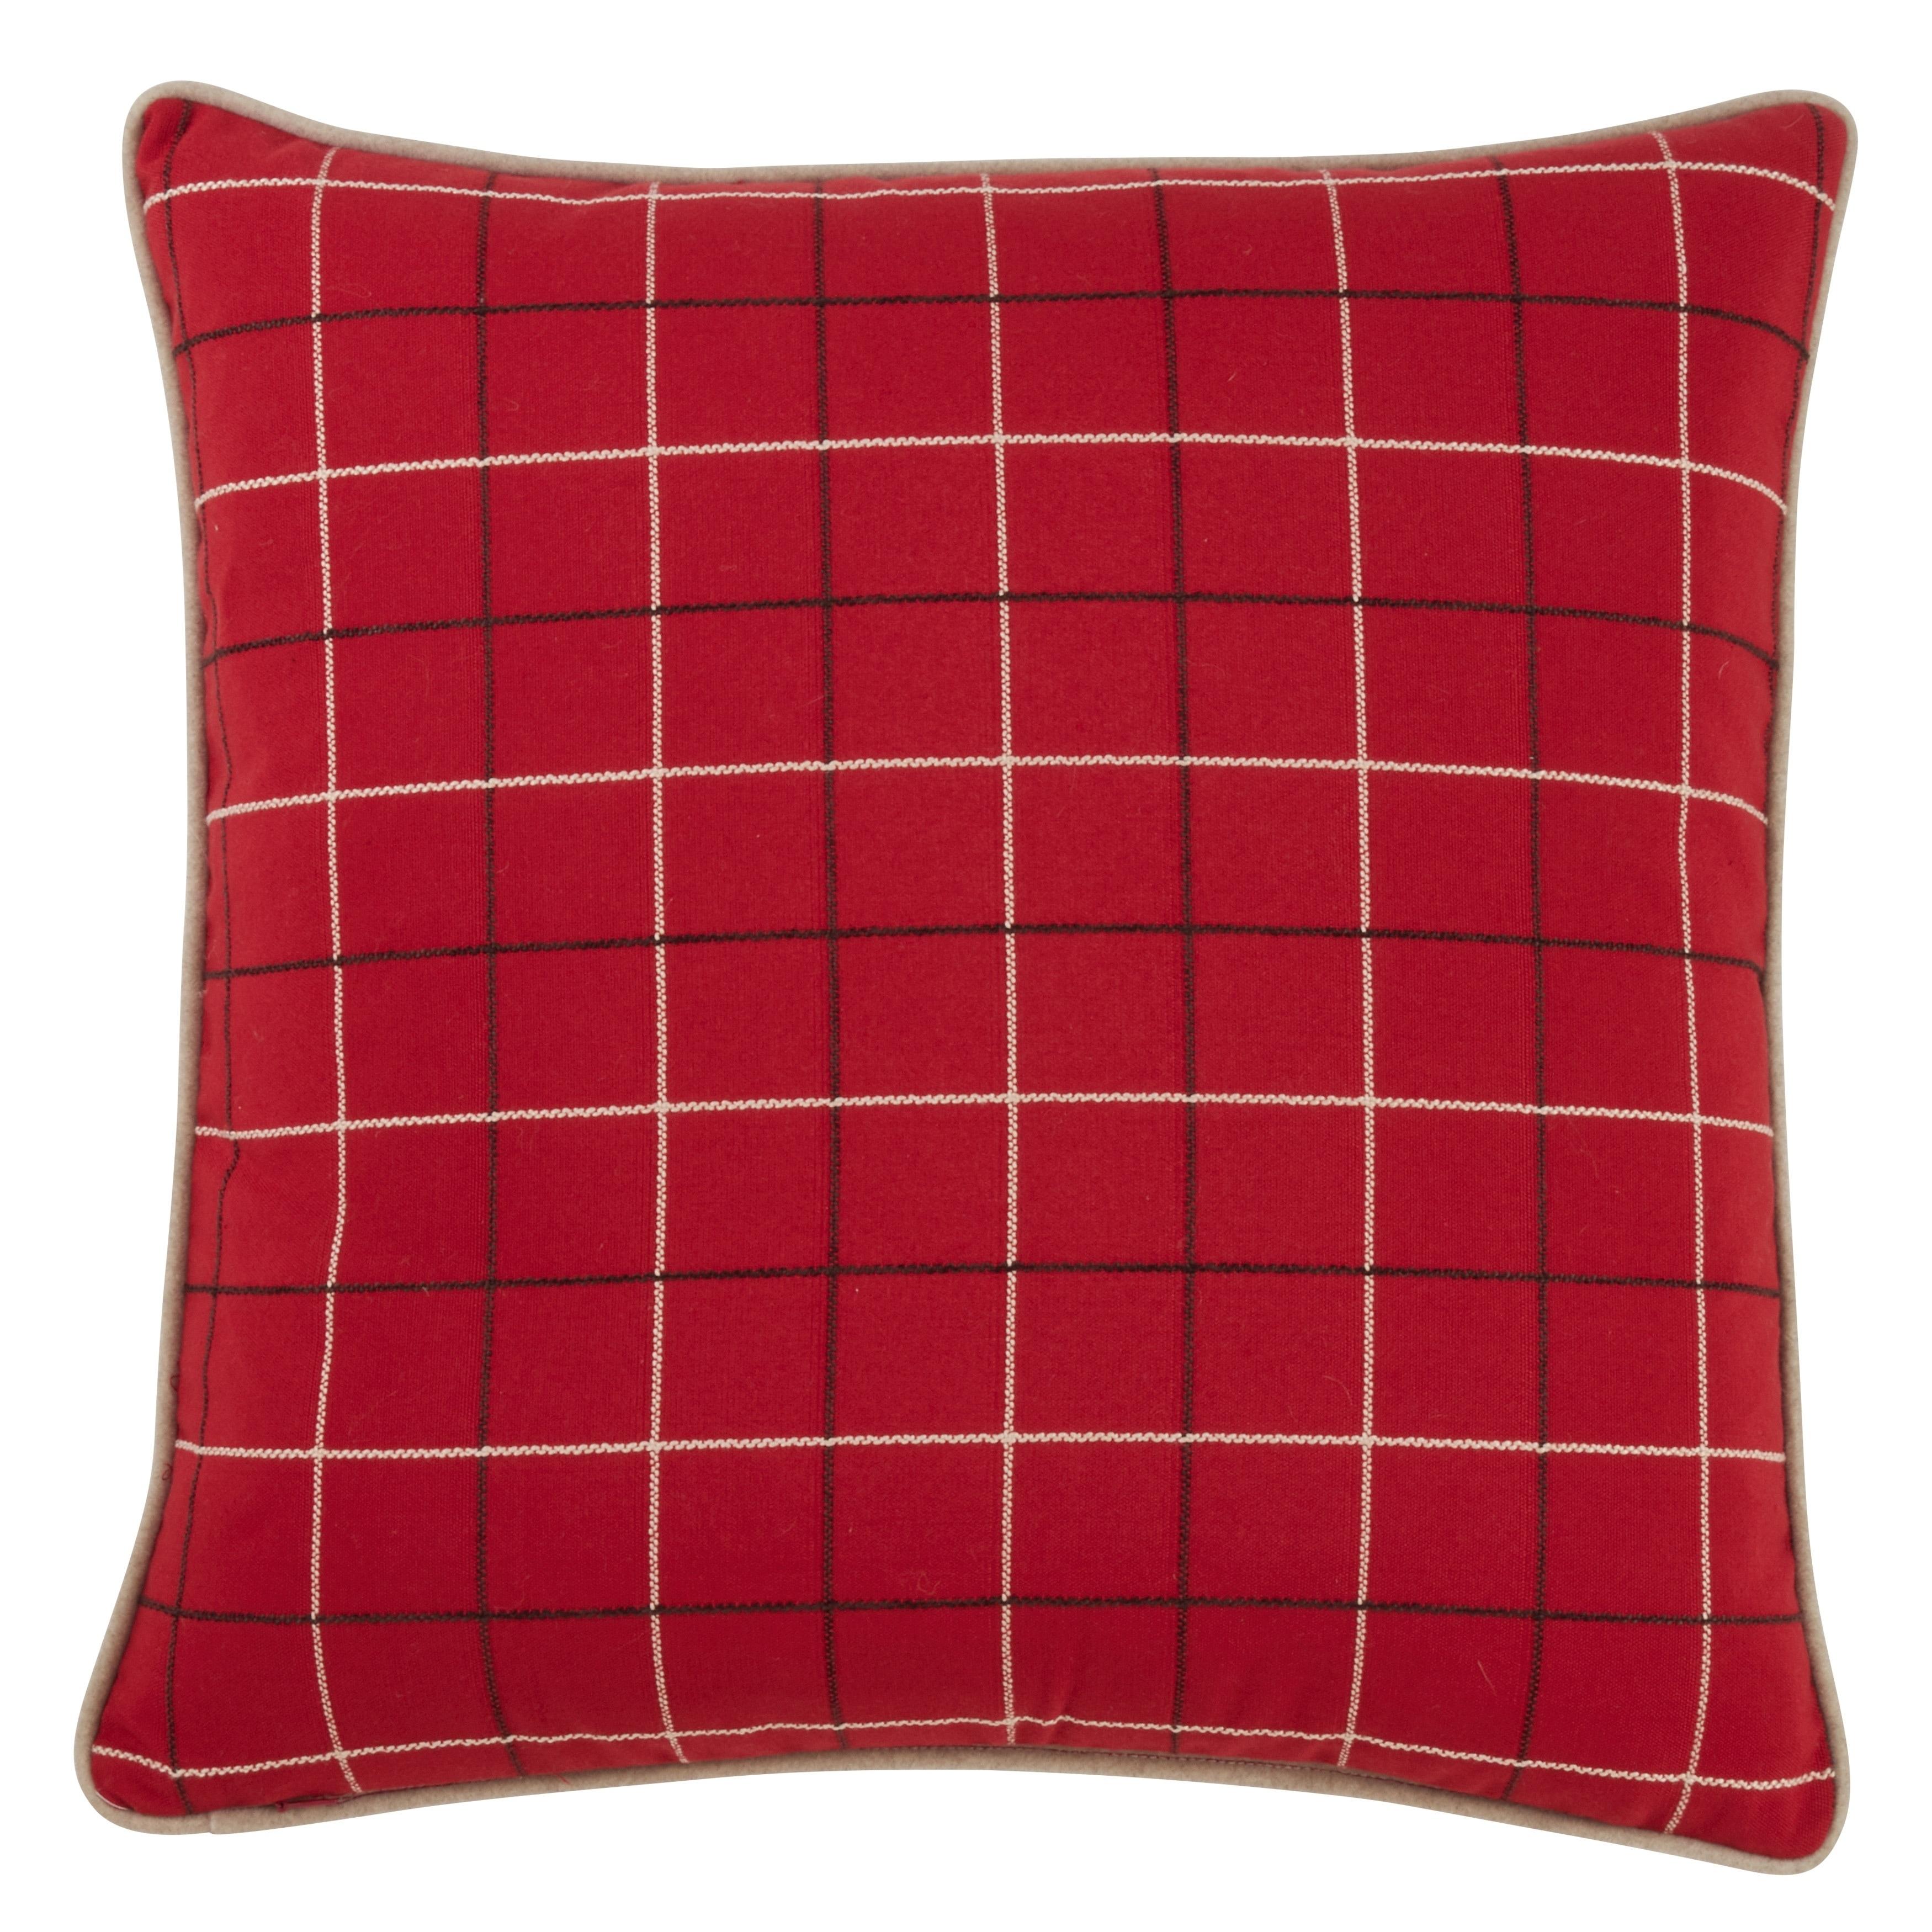 French Bulldog Design Plaid Christmas Pillow Overstock 29821723